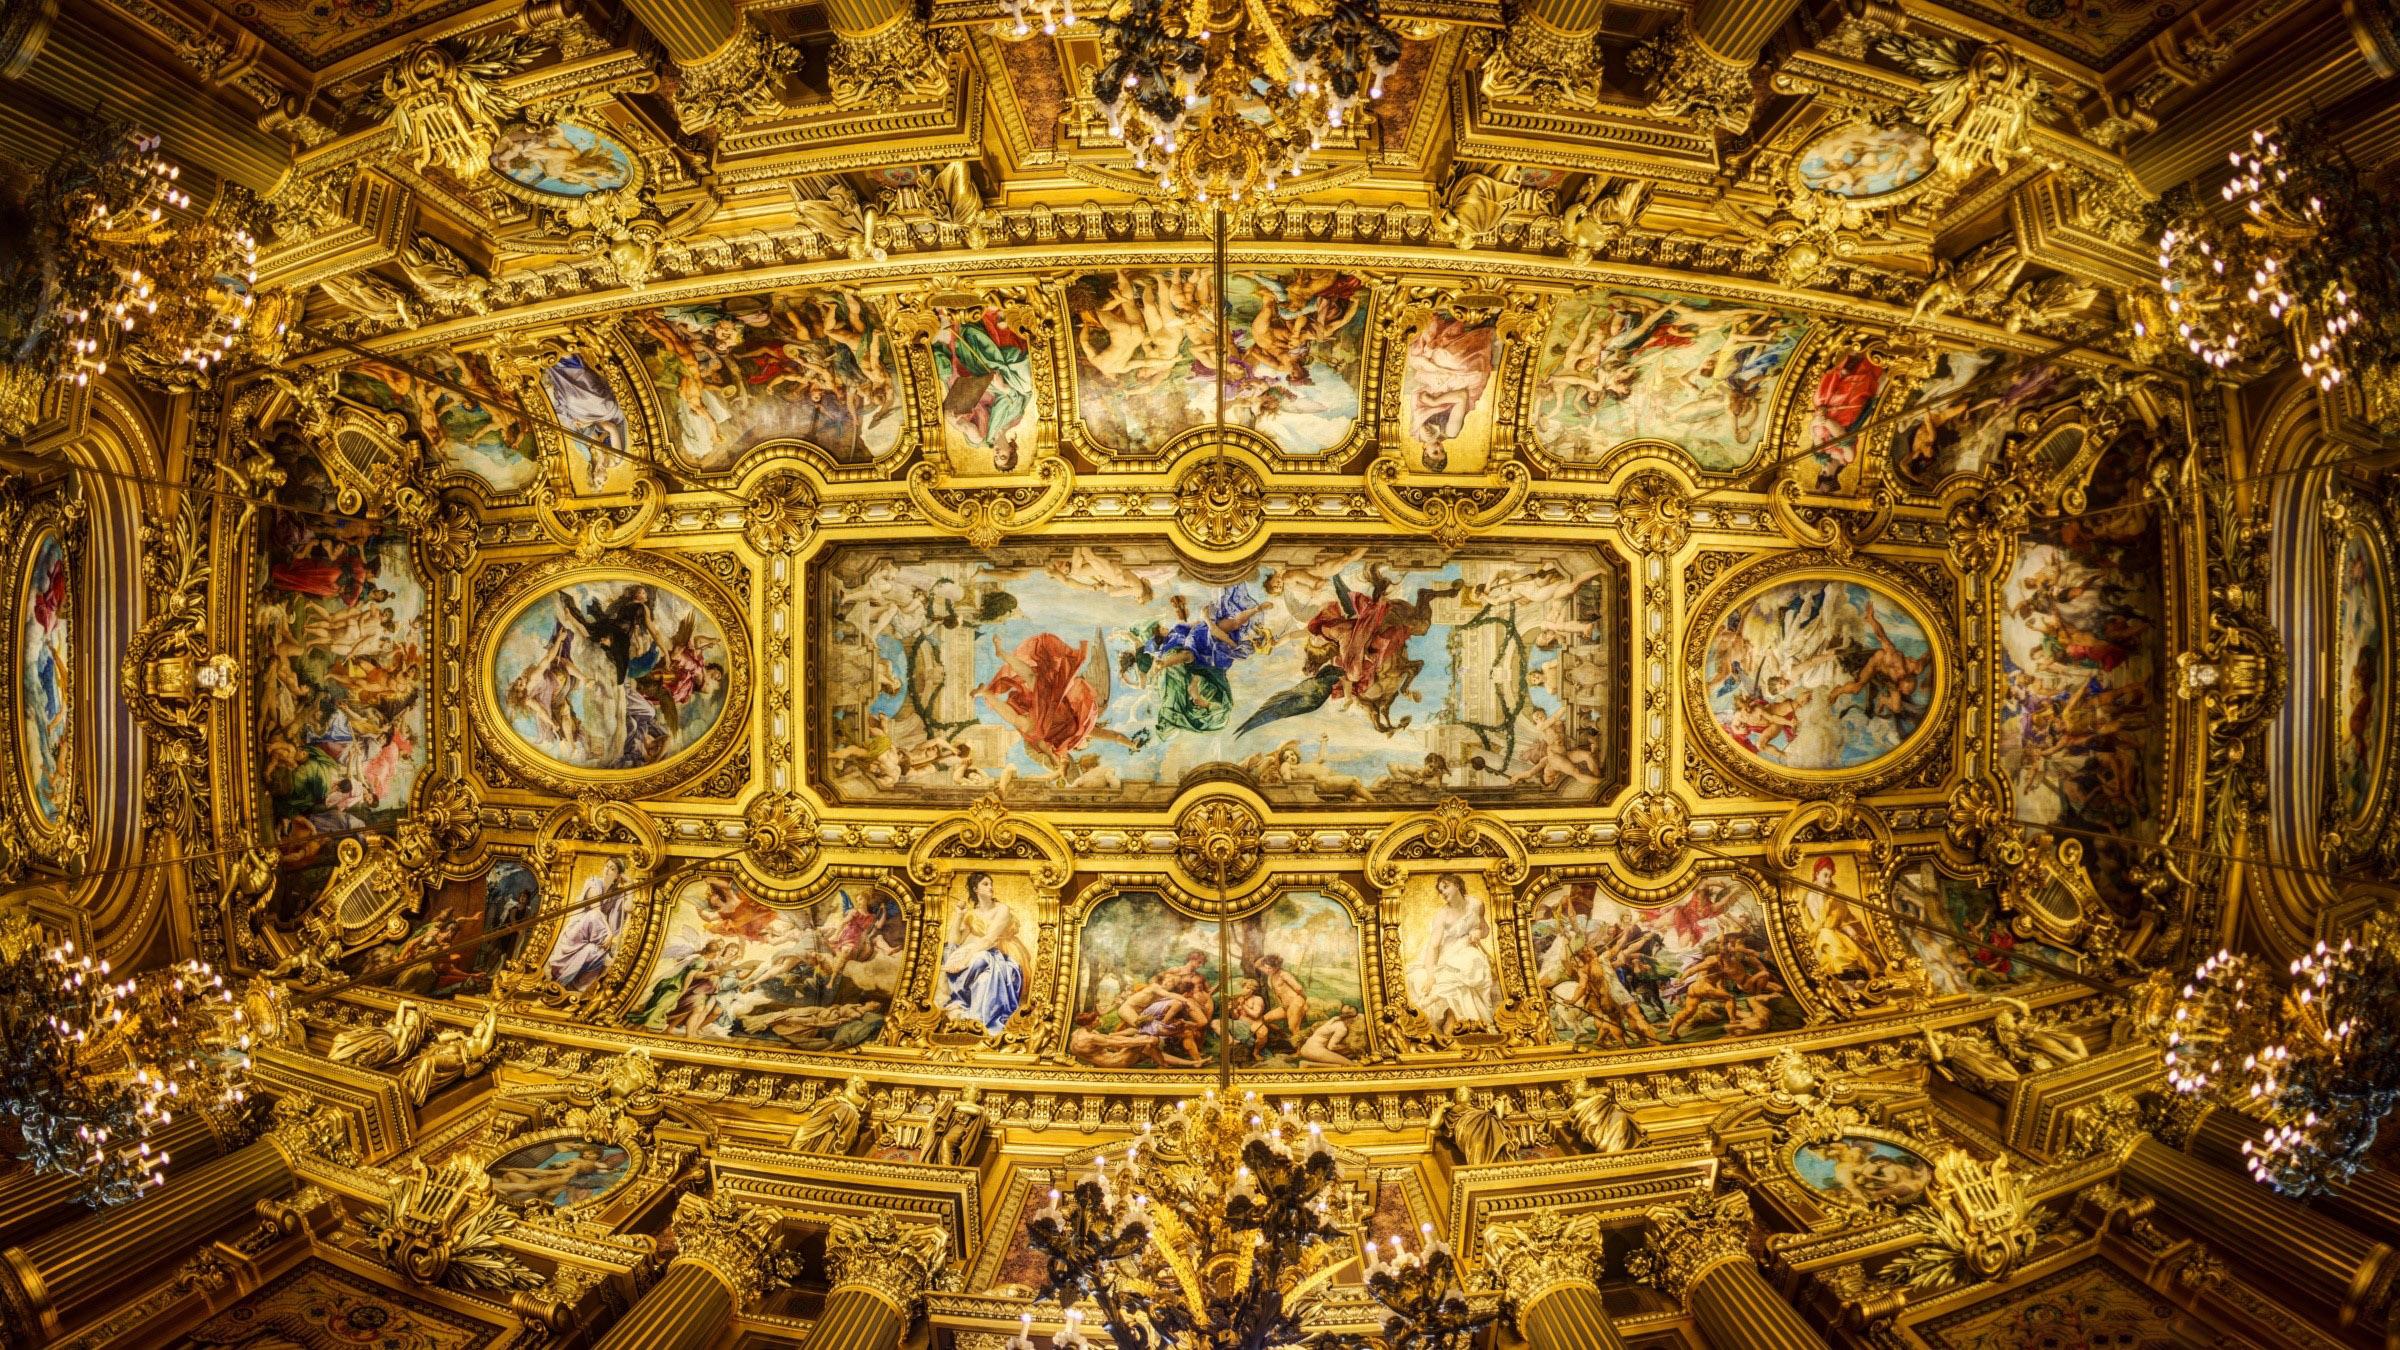 Wallpaper The roof of the Opera Garnier Grand